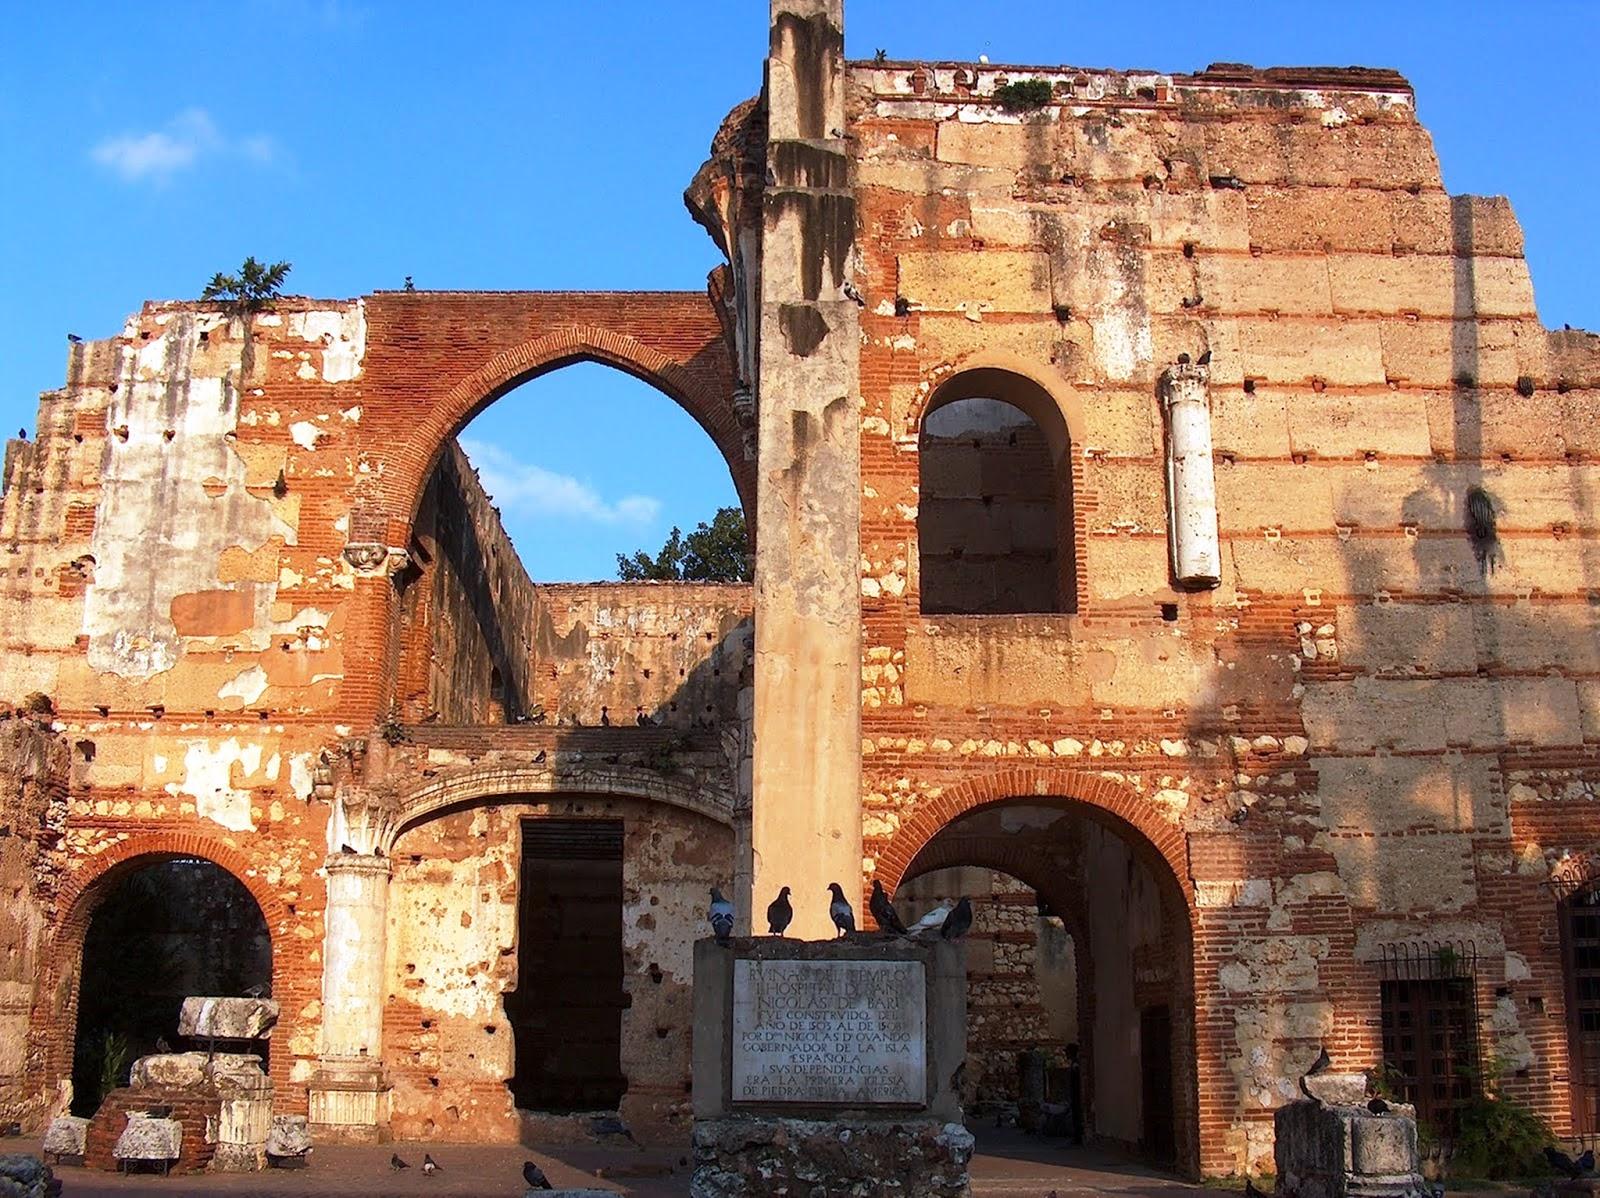 Ruins of the Hospital Nicolas de Ovando Colonial Zone